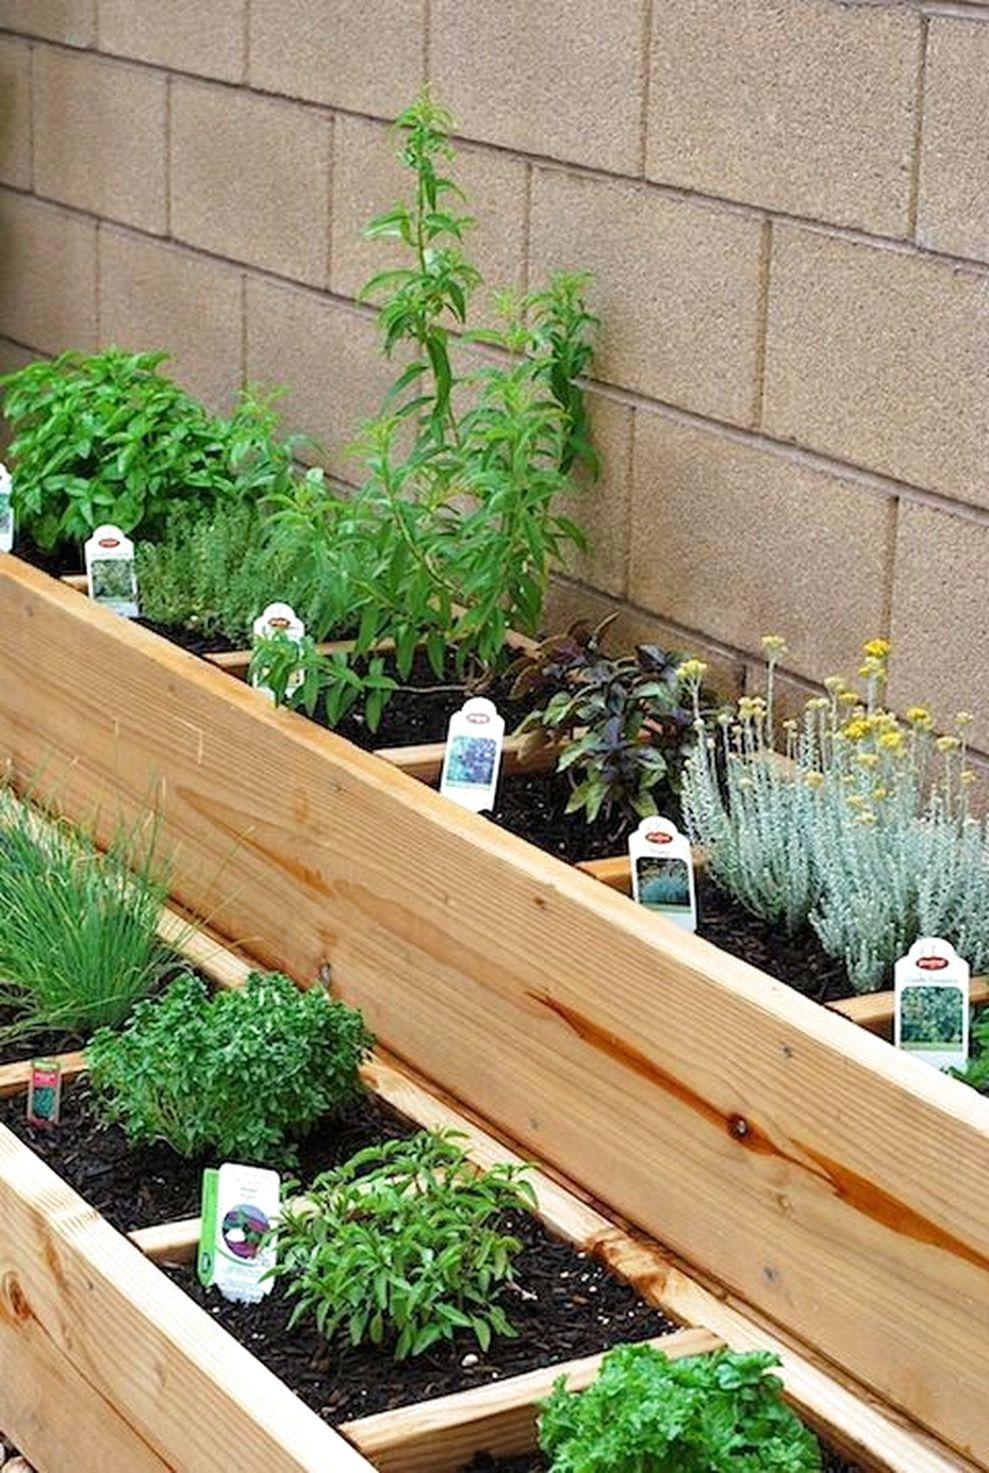 45 Best Backyard Vegetable Garden Designs Ideas Home Garden Small Patio Garden Raised Bed Herb Garden Backyard Vegetable Gardens